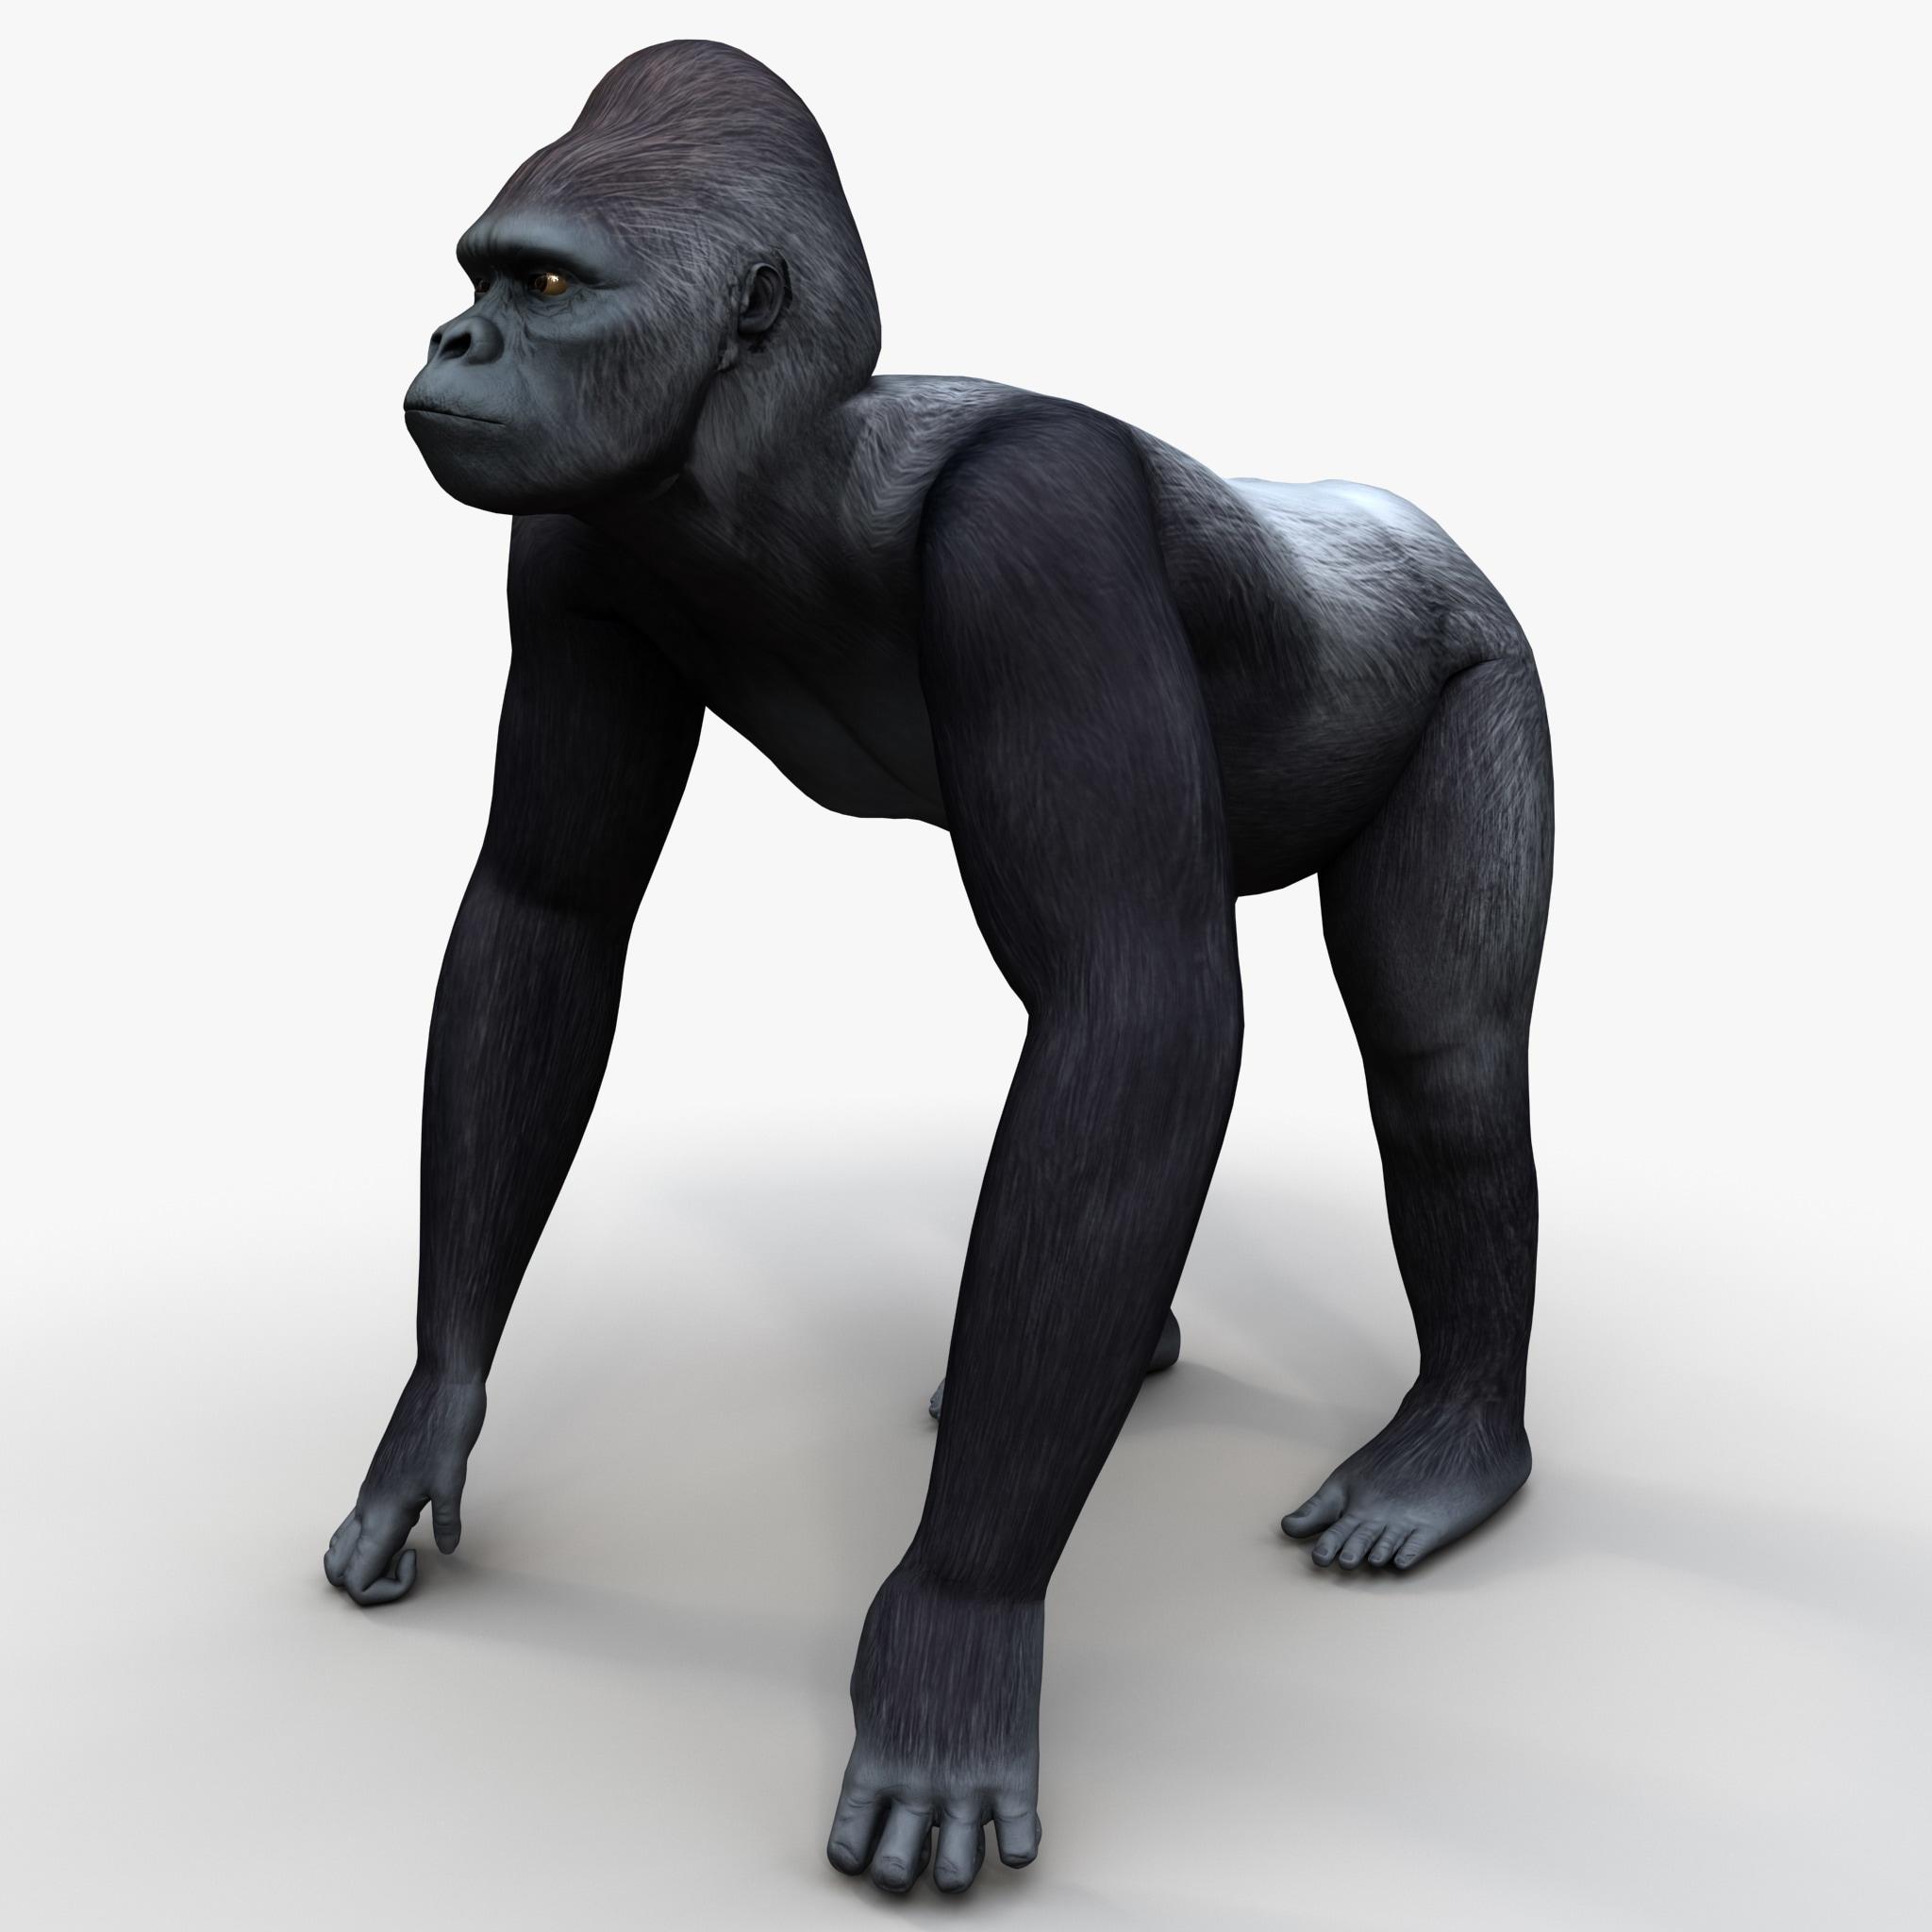 gorilla pose 2 3d model